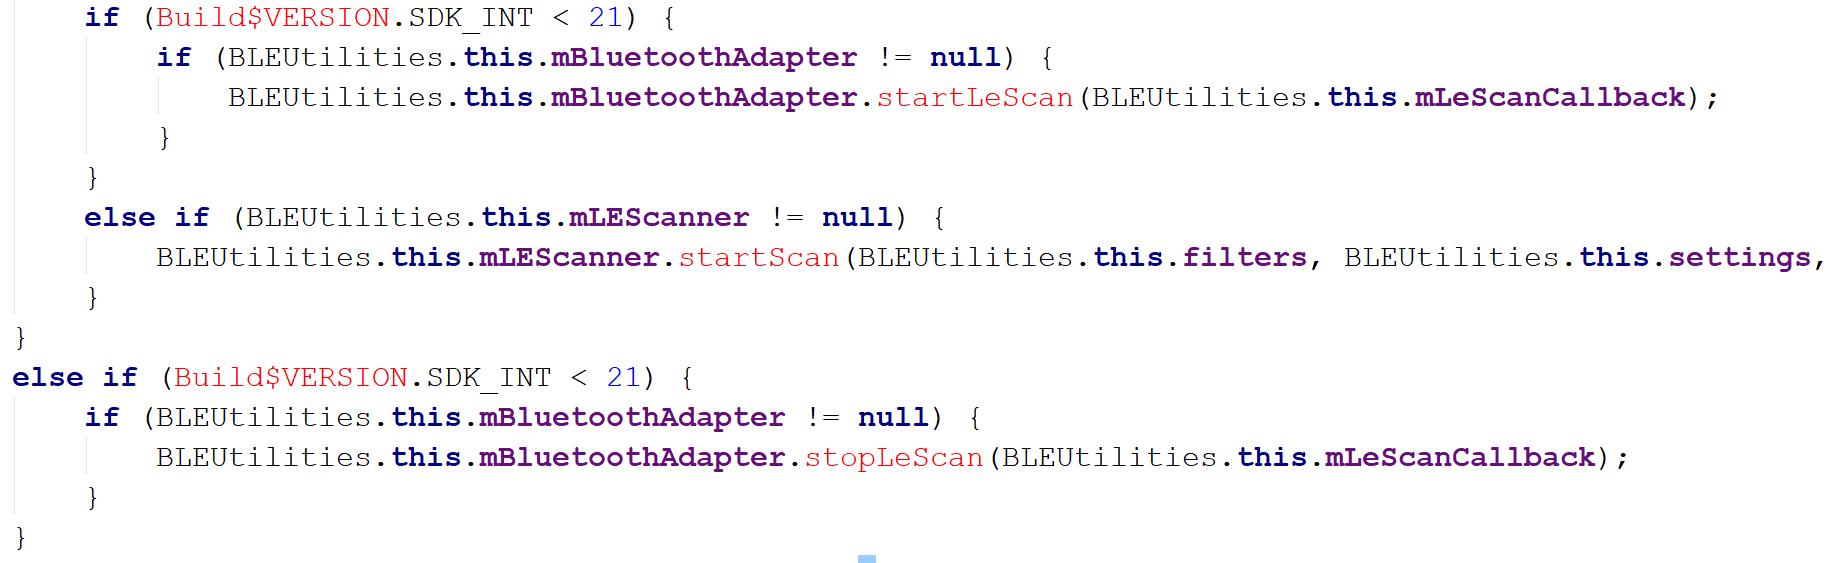 VerSprite Hacking an Aftermarket Remote Start System Part 1